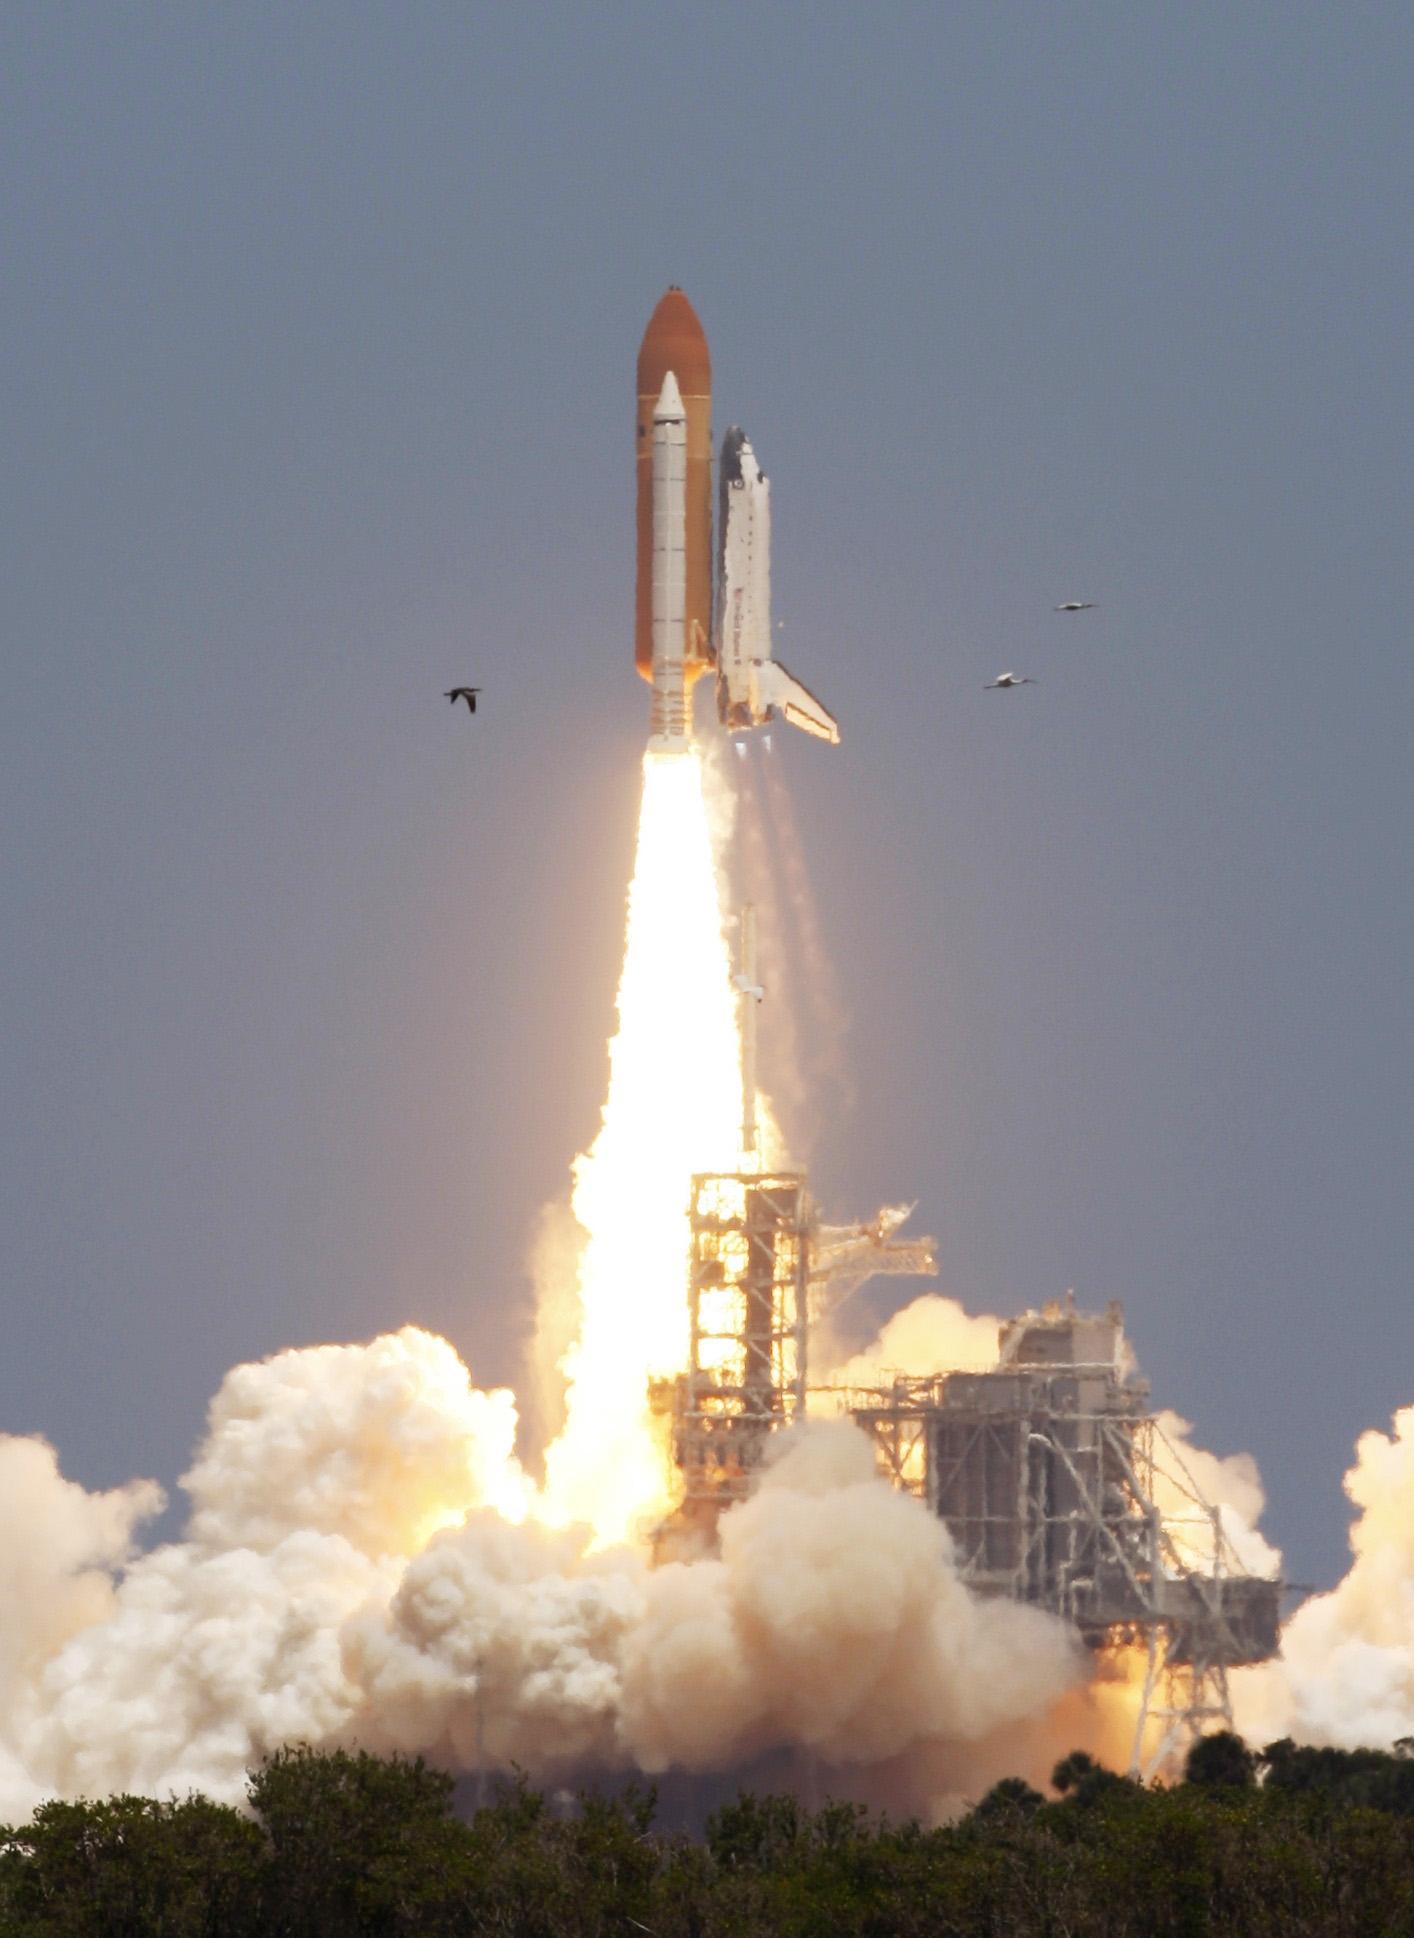 U.S. shuttle Atlantis lifts off for final journey